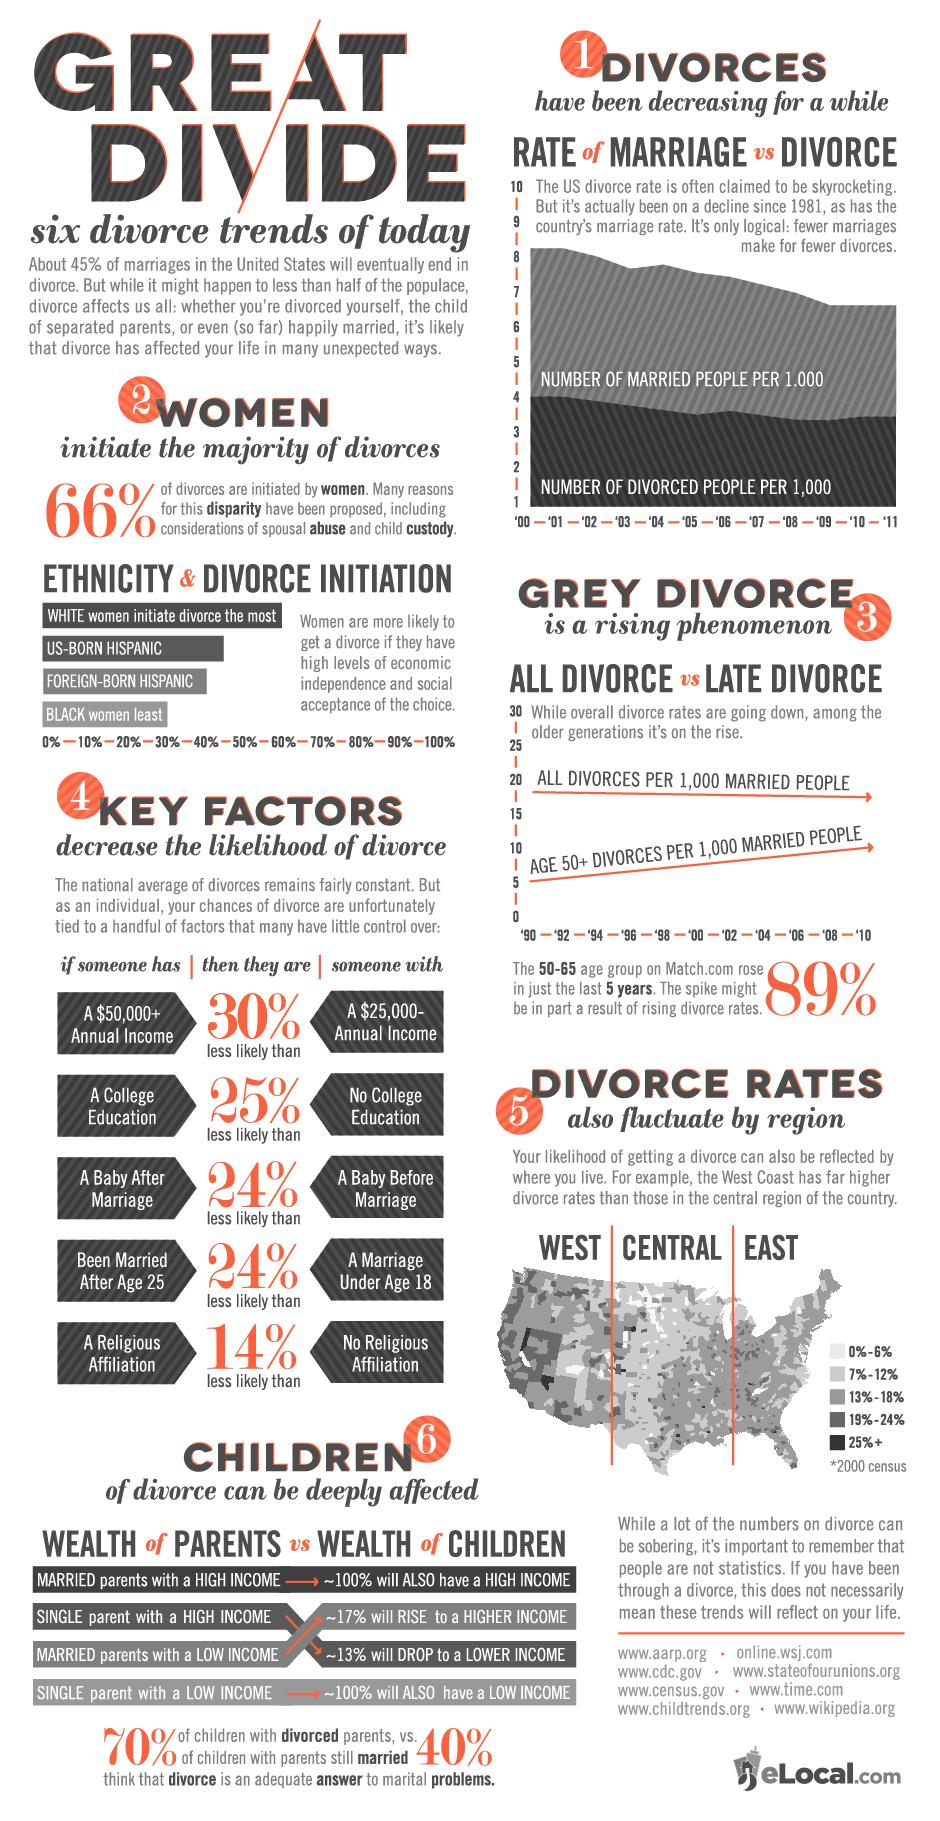 generation x less divorce rate